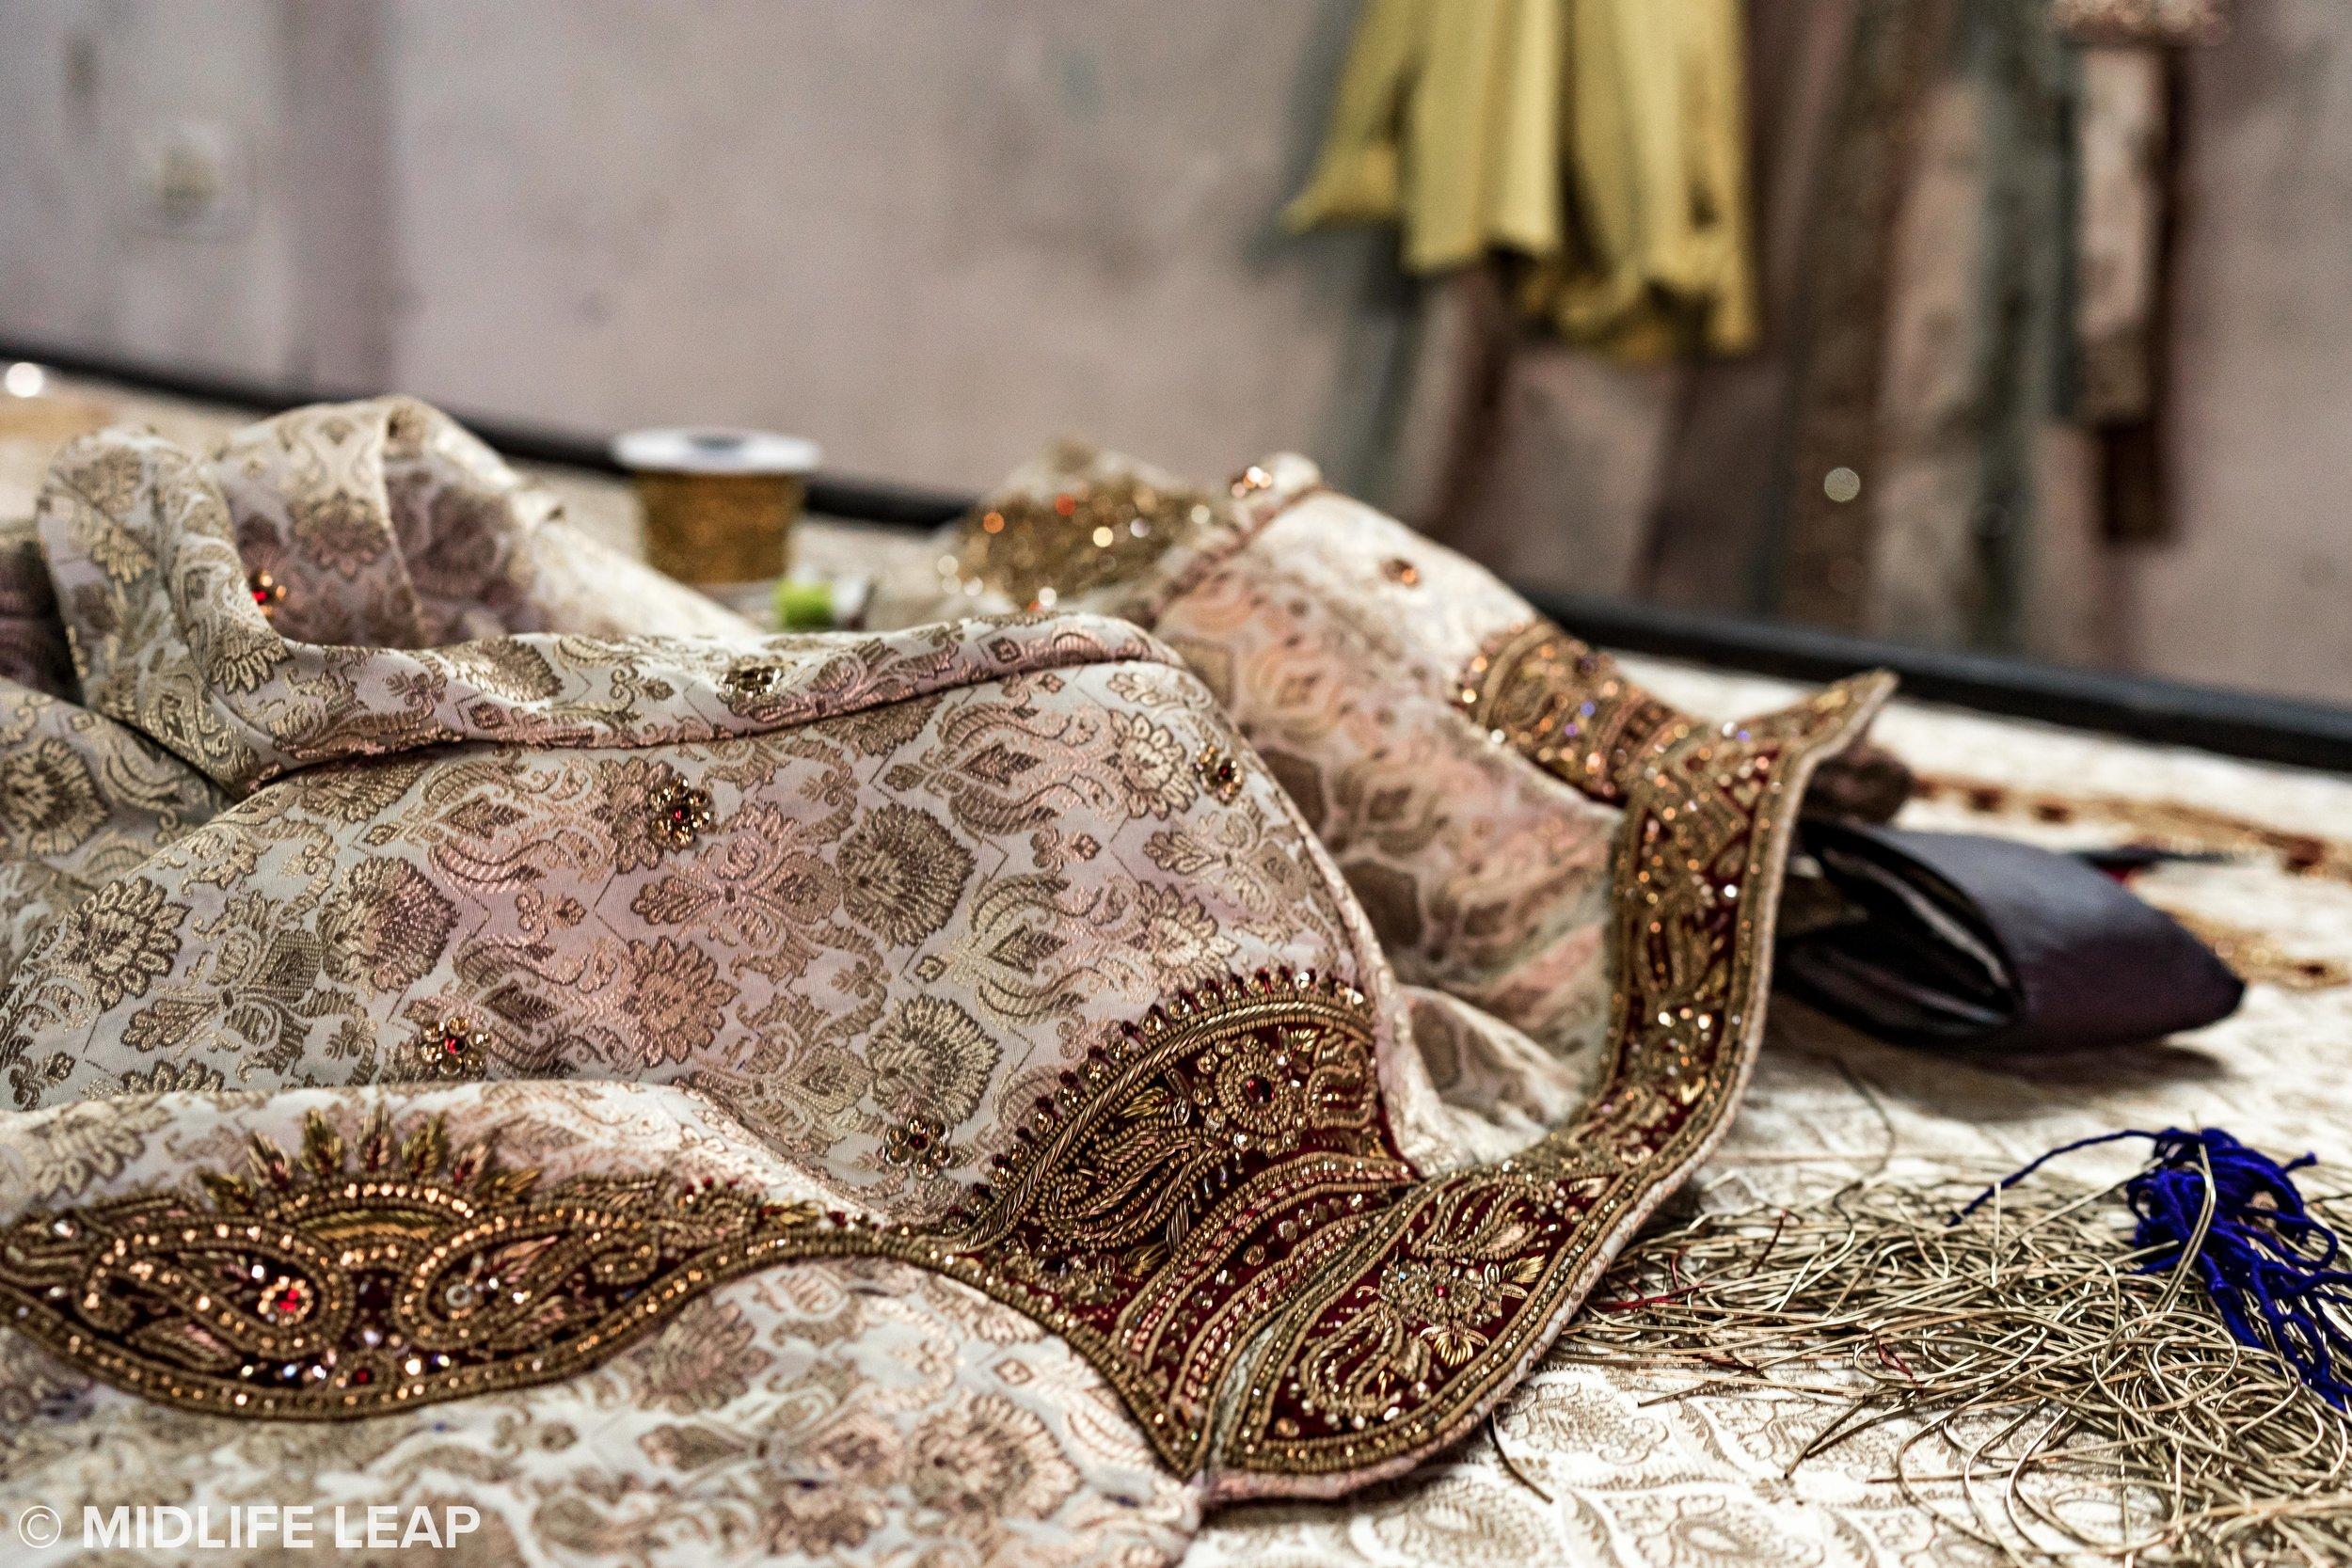 hand-embroidery-bead-work-jaipur-rajasthan.jpg